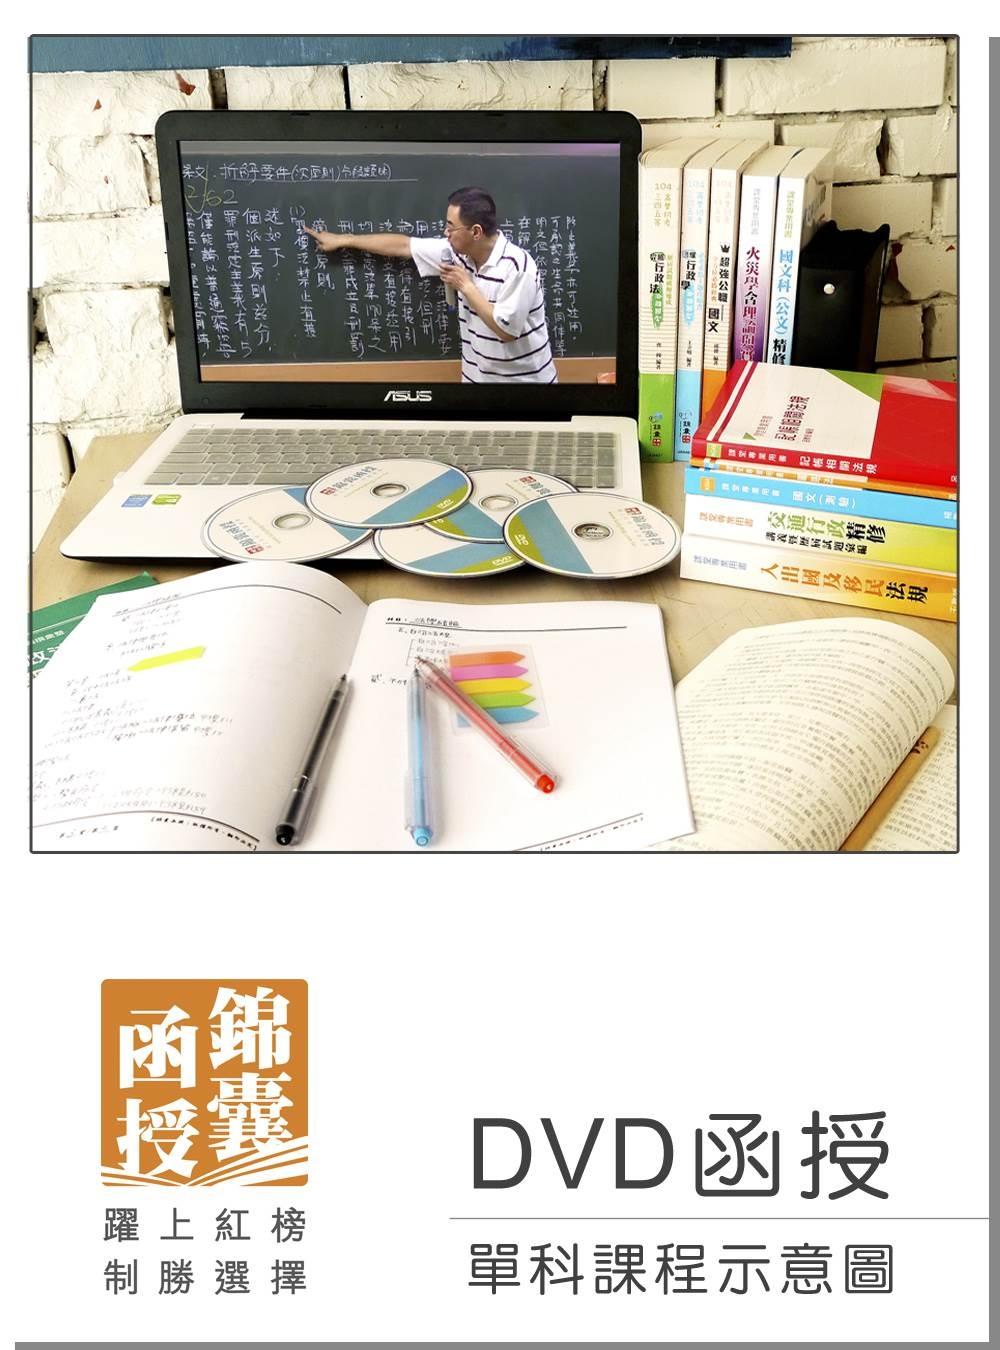 【DVD函授】中外歷史:單科課程(105版)